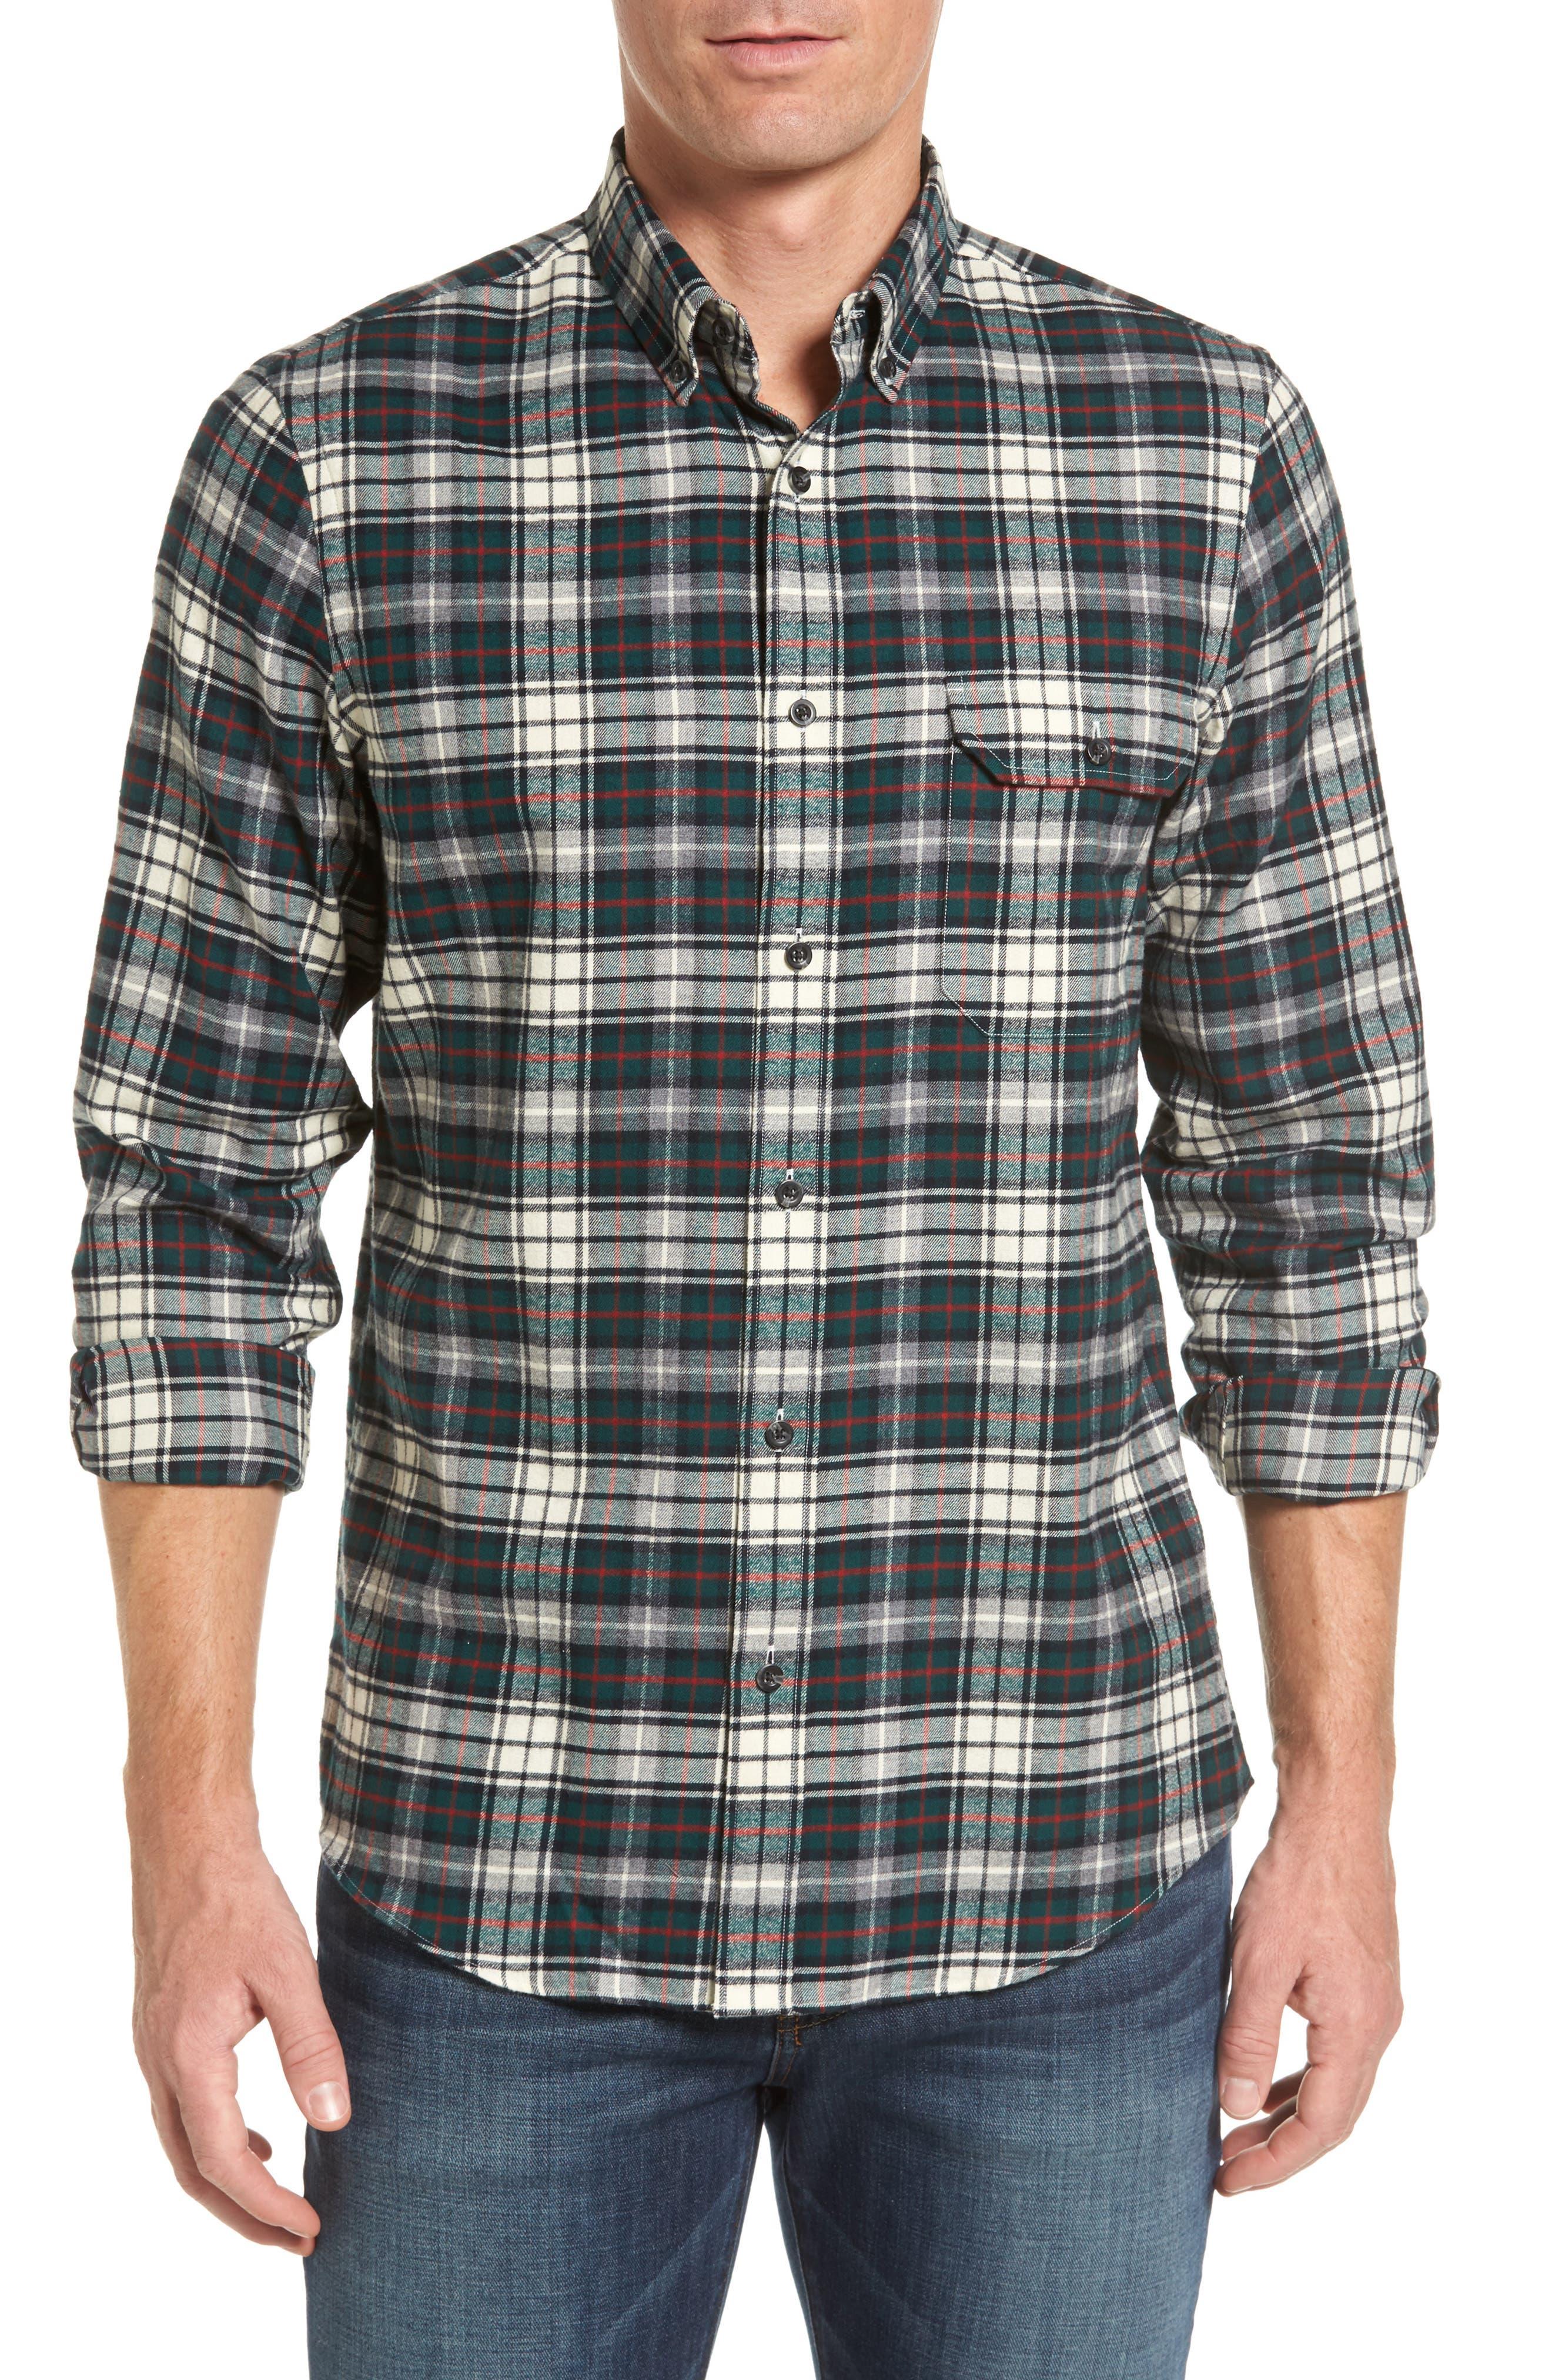 Regular Fit Plaid Sport Shirt,                         Main,                         color, Green Bug Plaid Flannel